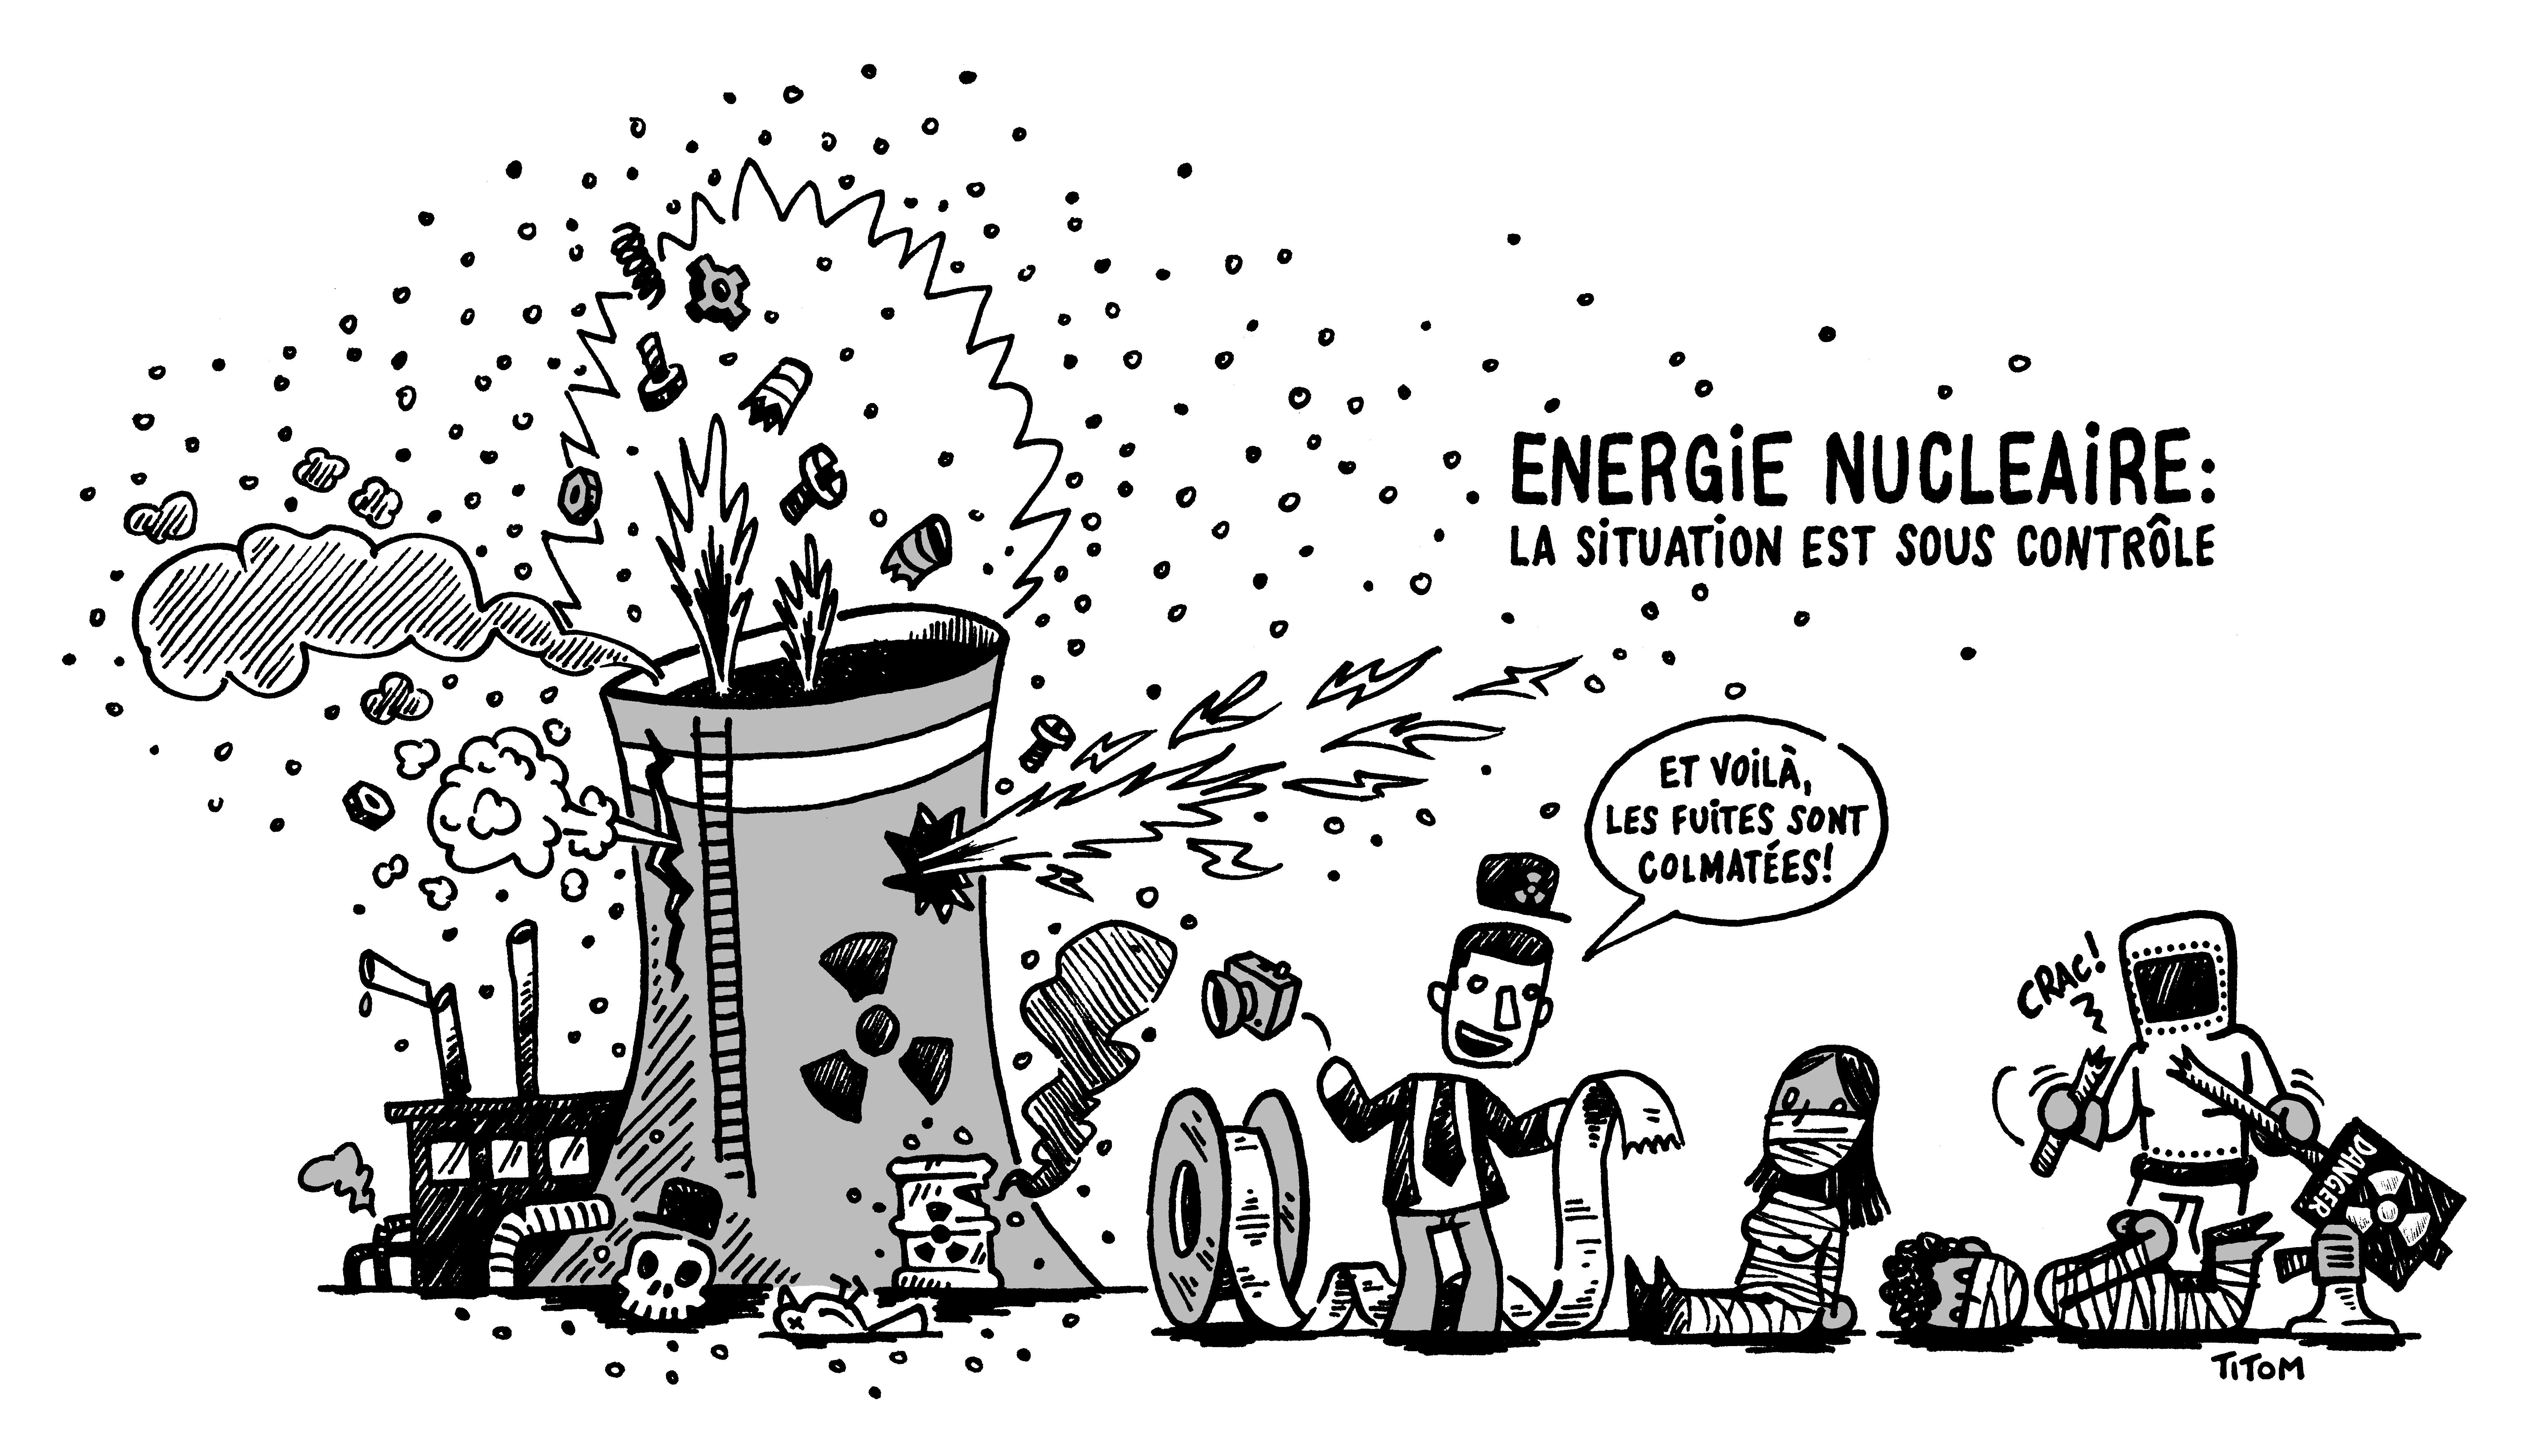 titom_nucleaire.jpg